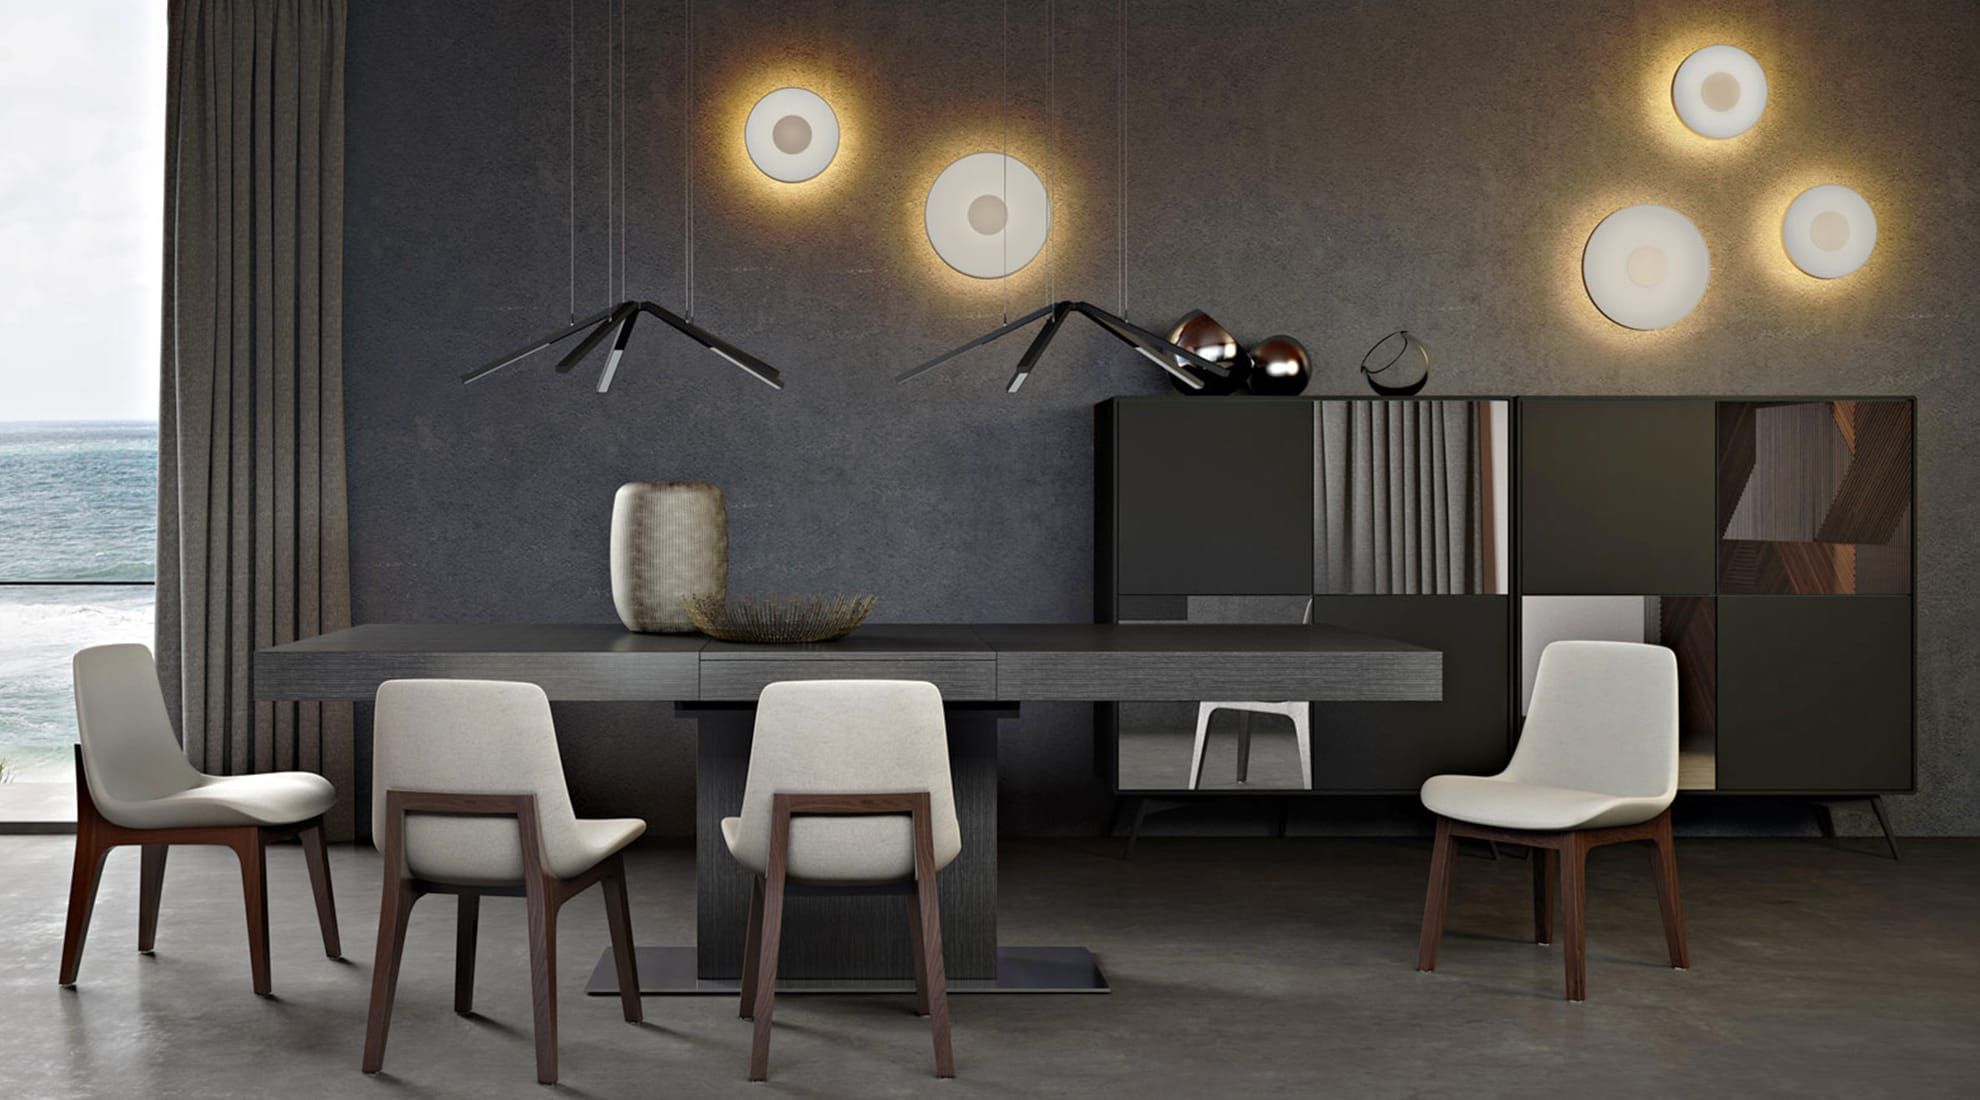 Astor Dining Table by Modloft and Thor Light by Studio Italia Design